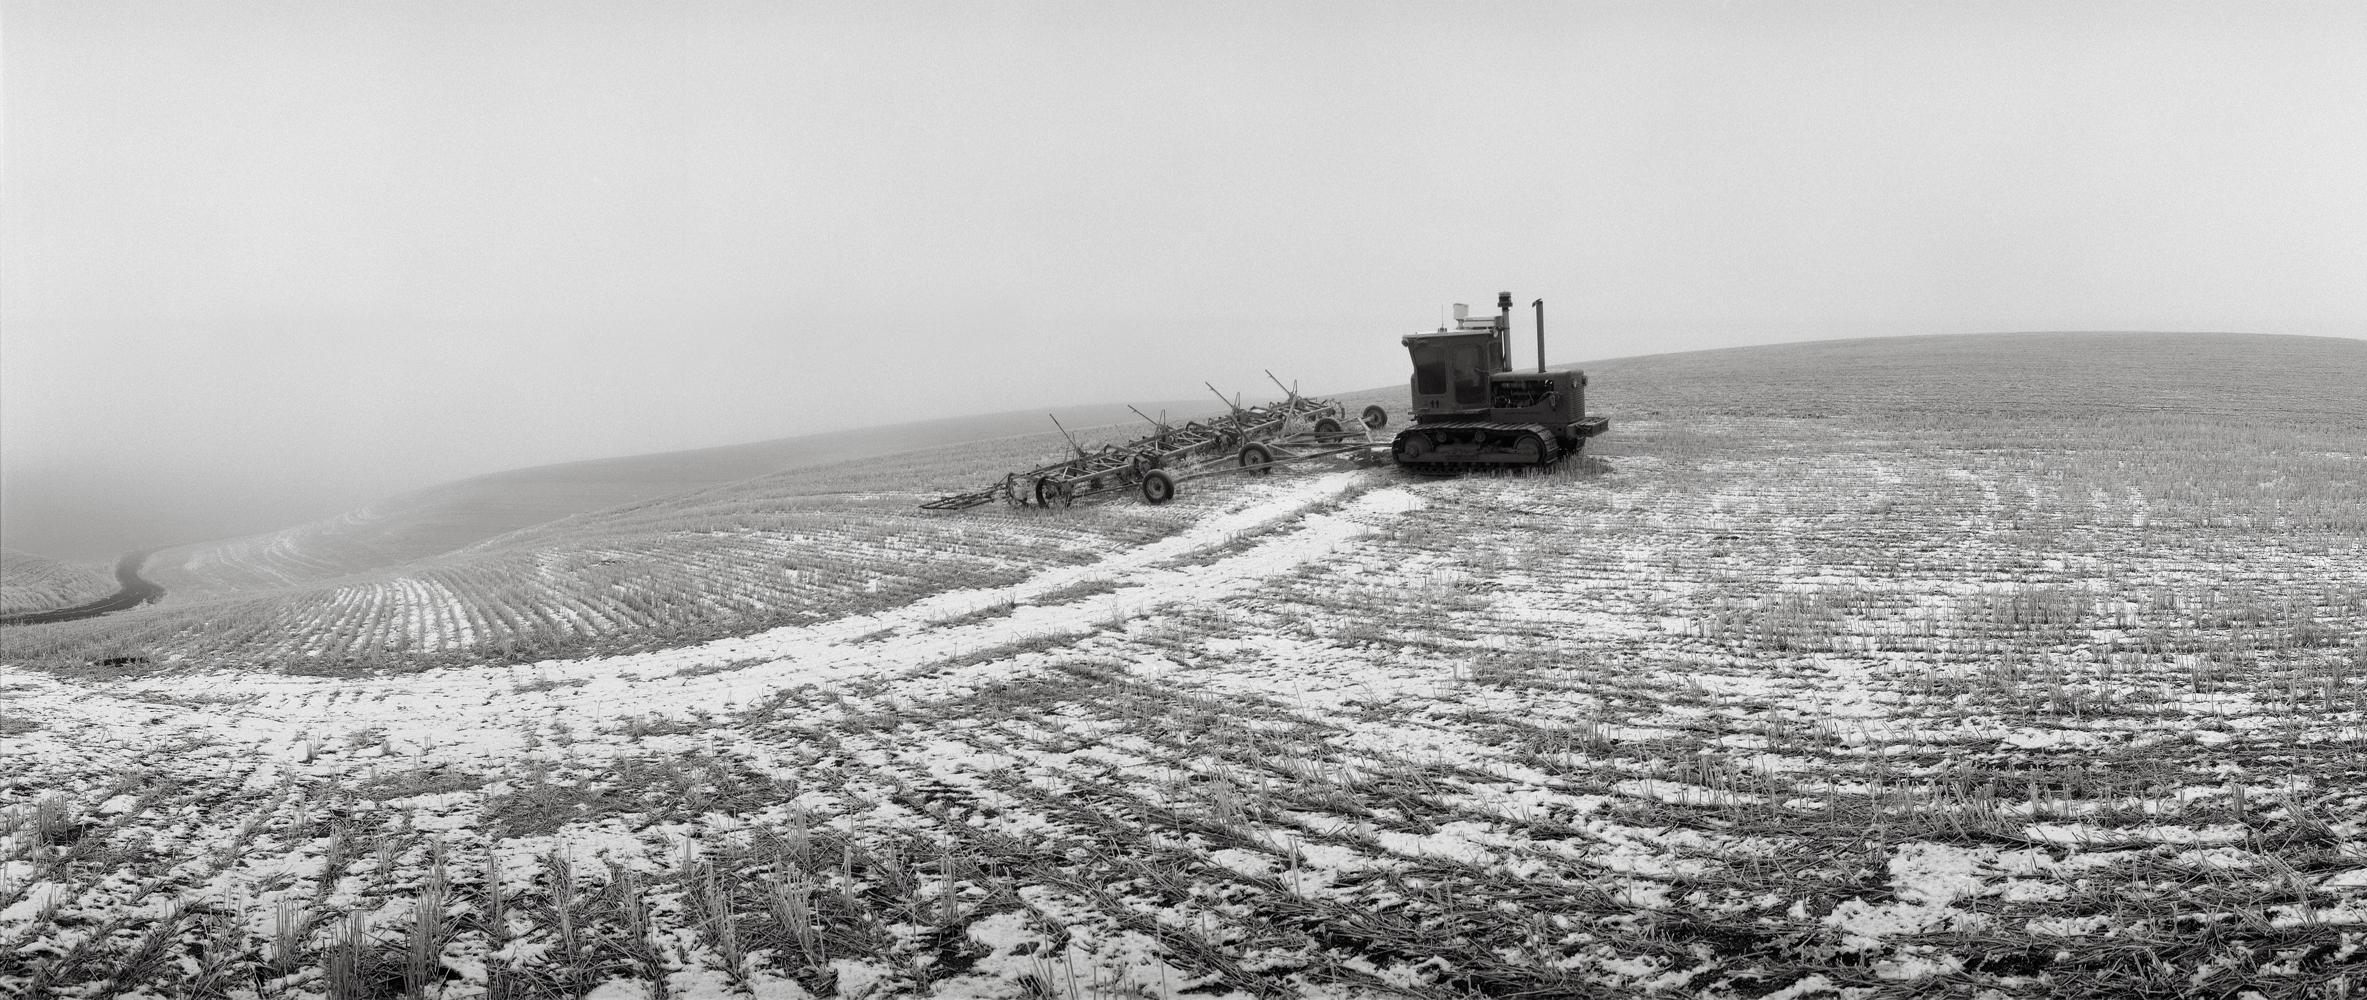 Tractor, Washington